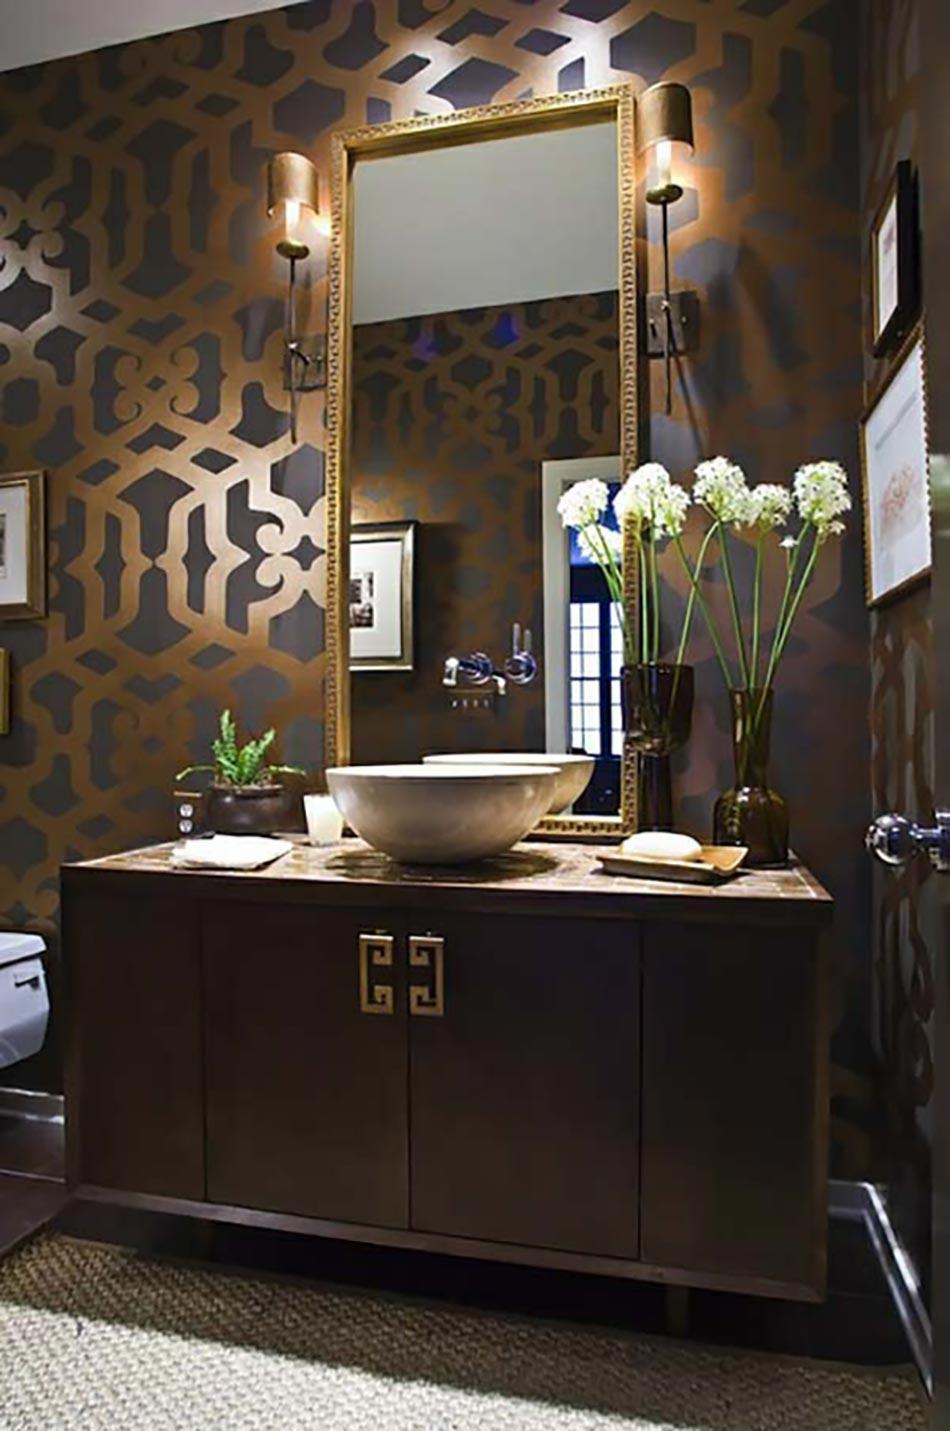 Phrase Deco Salle De Bain ~ des teintes sombres pour une salle de bain moderne design feria